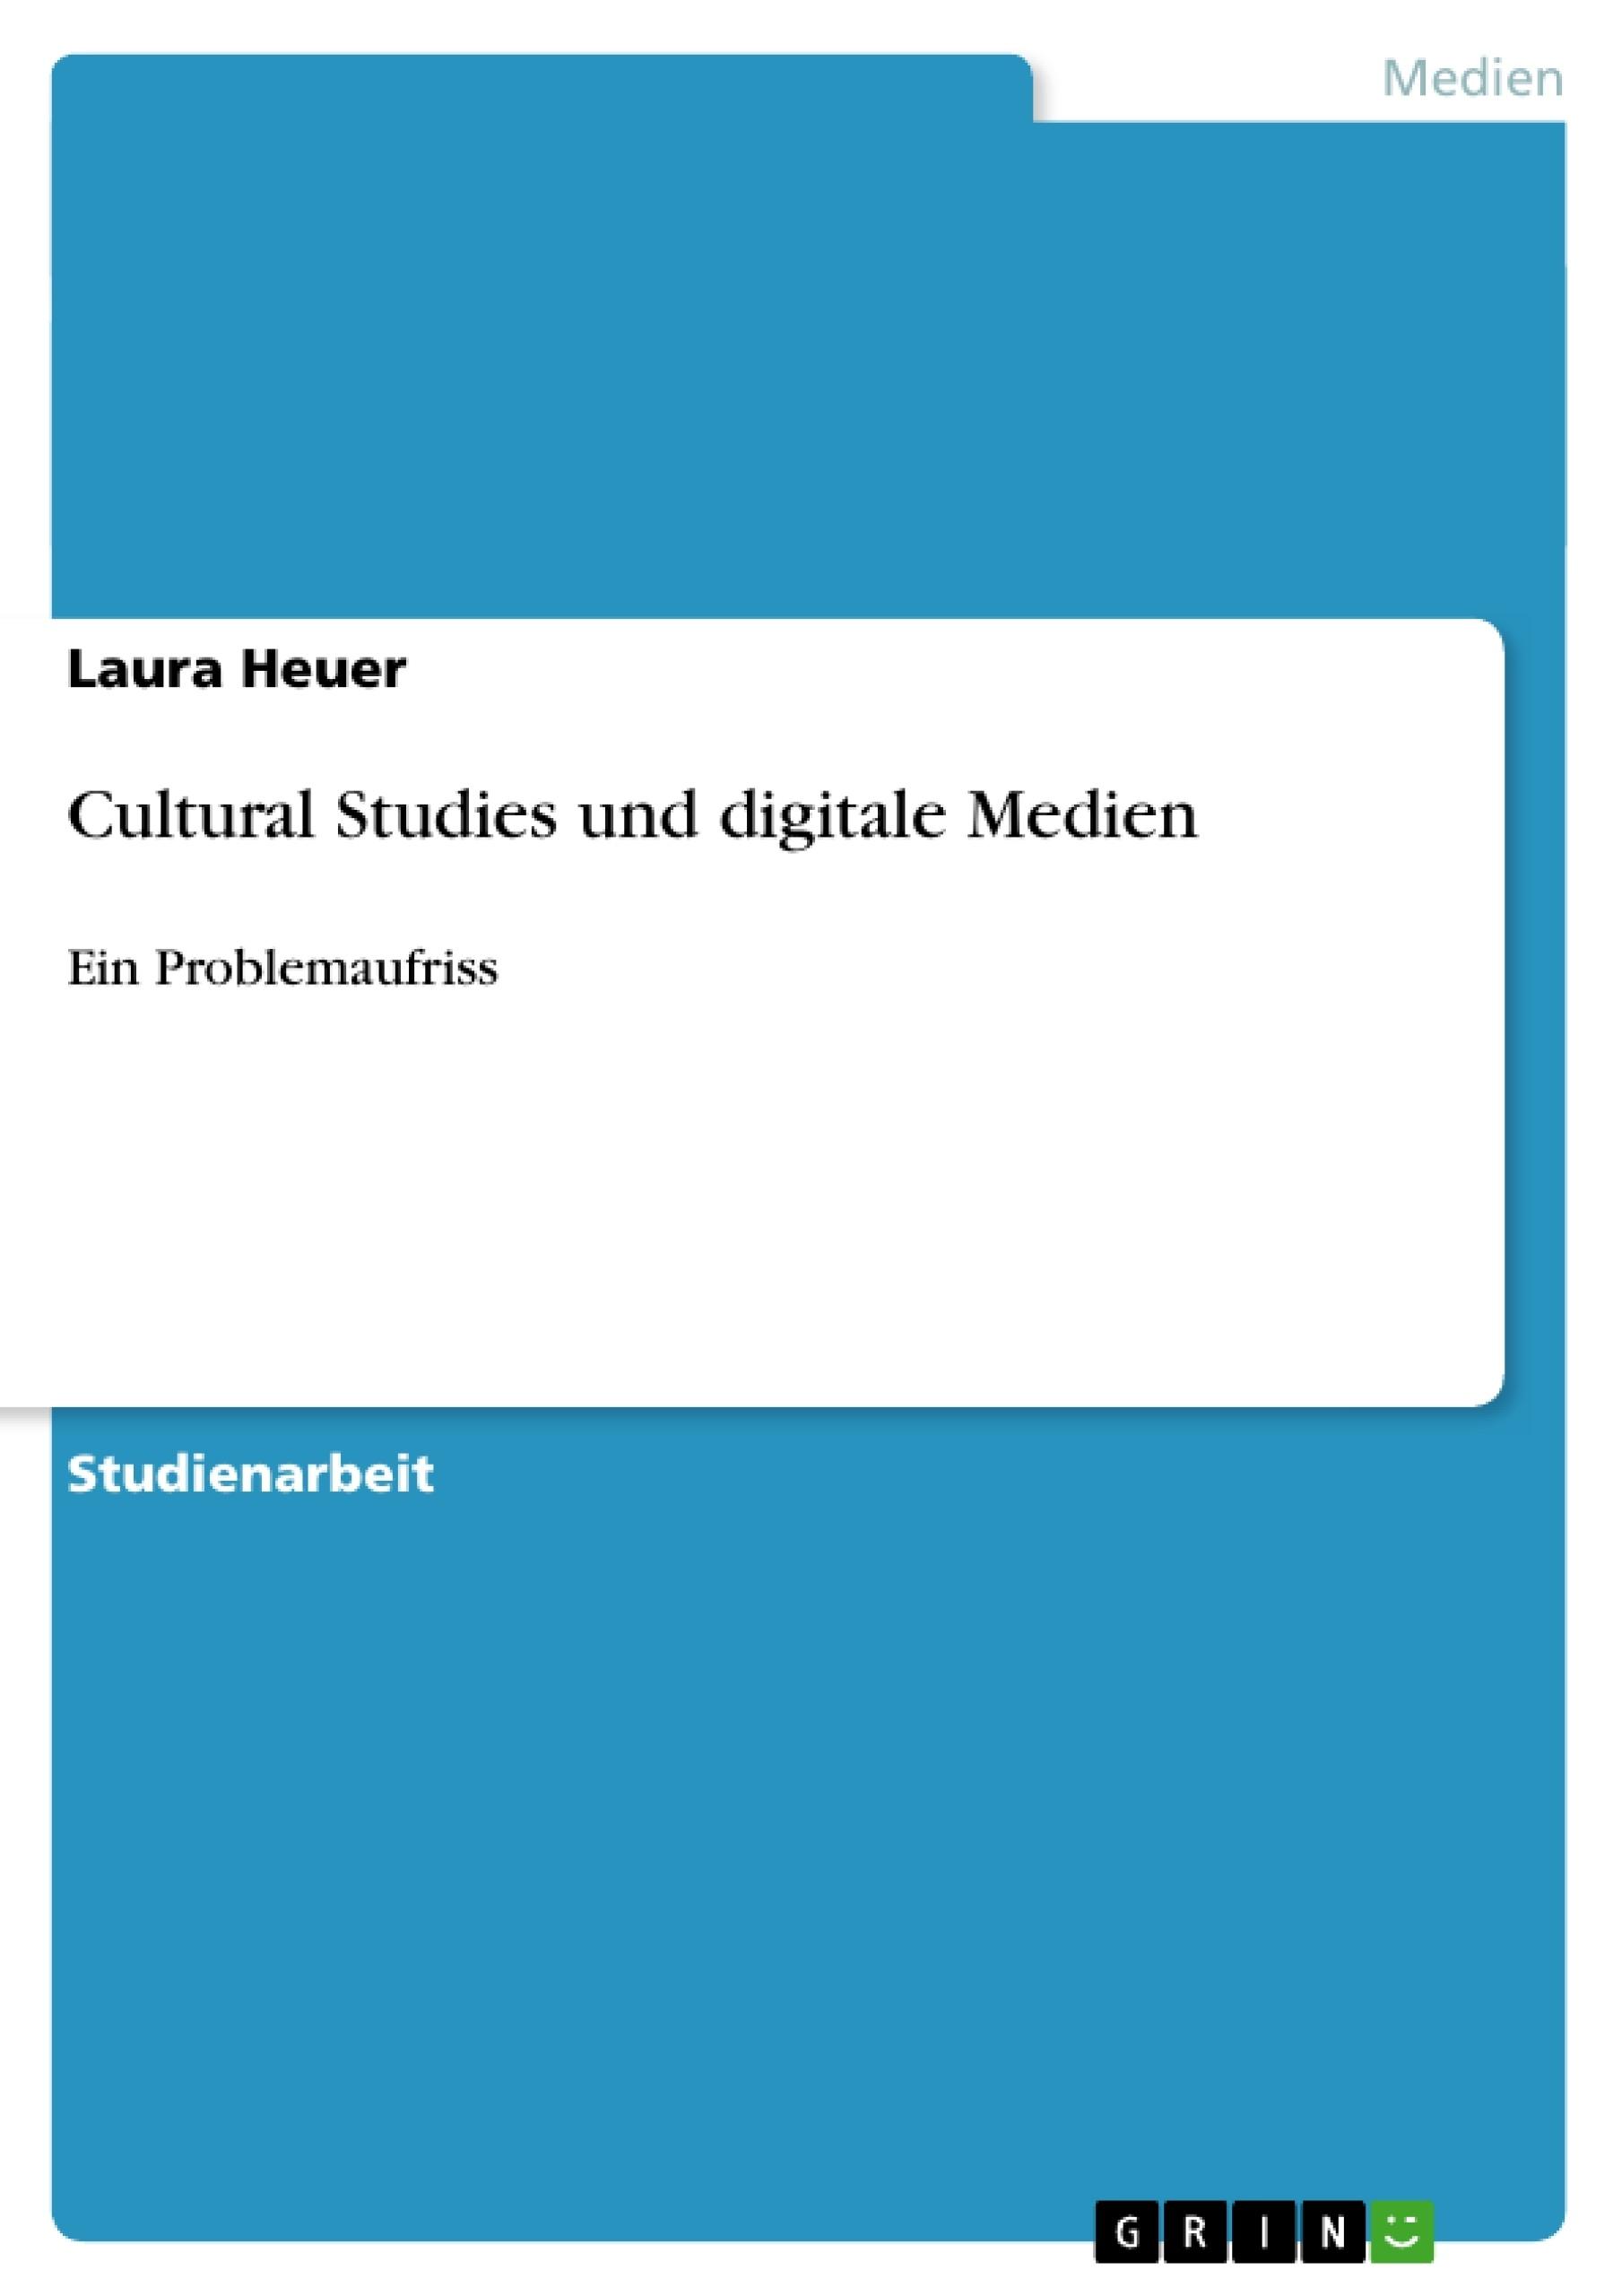 Titel: Cultural Studies und digitale Medien